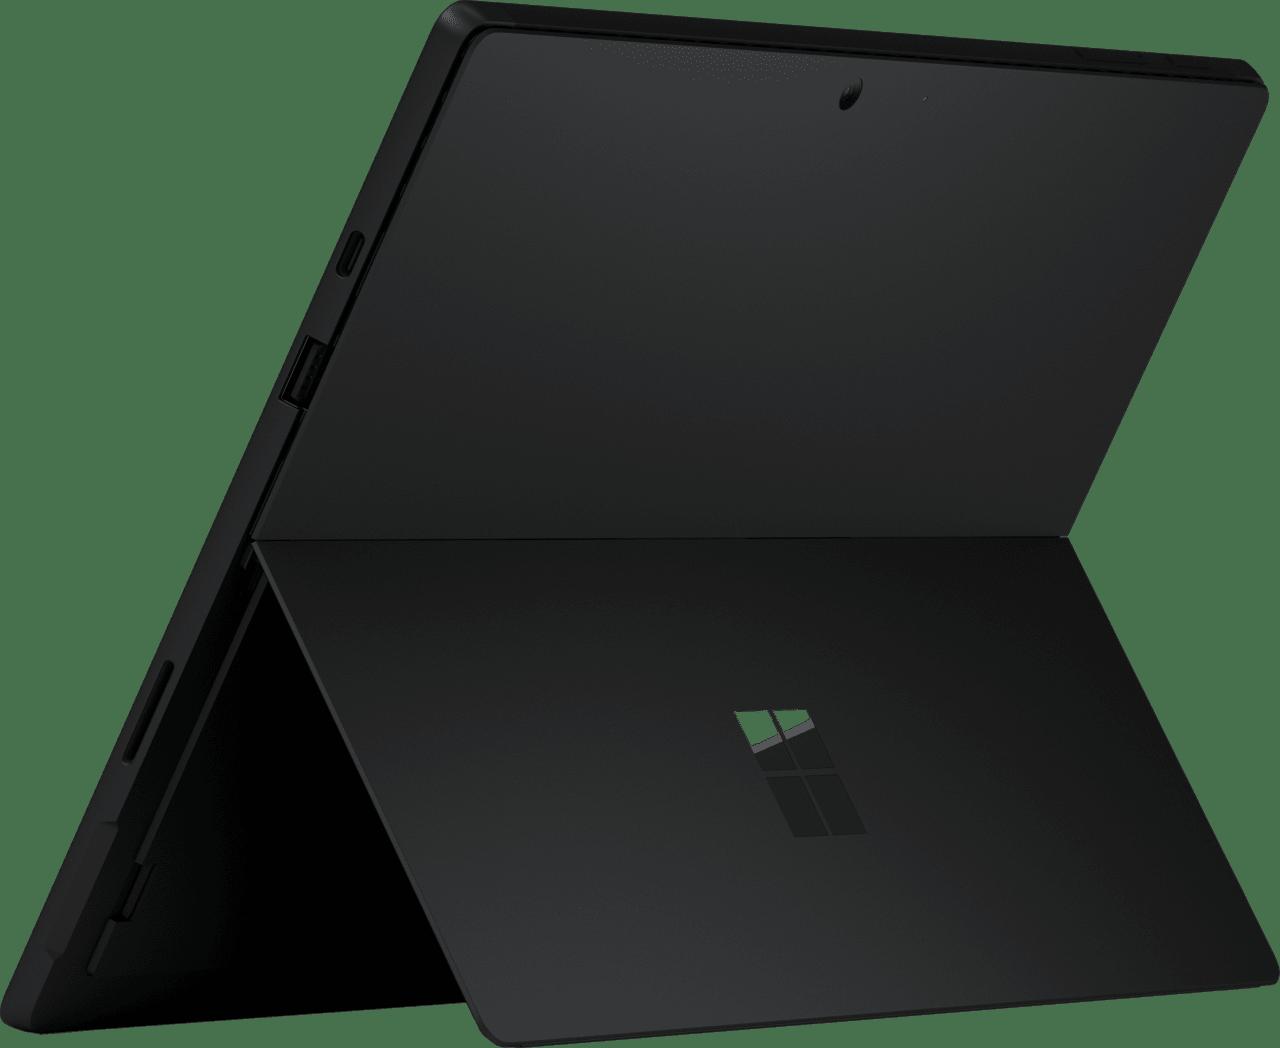 Matte Black Microsoft Surface Pro 7 Wi-Fi 512GB.3